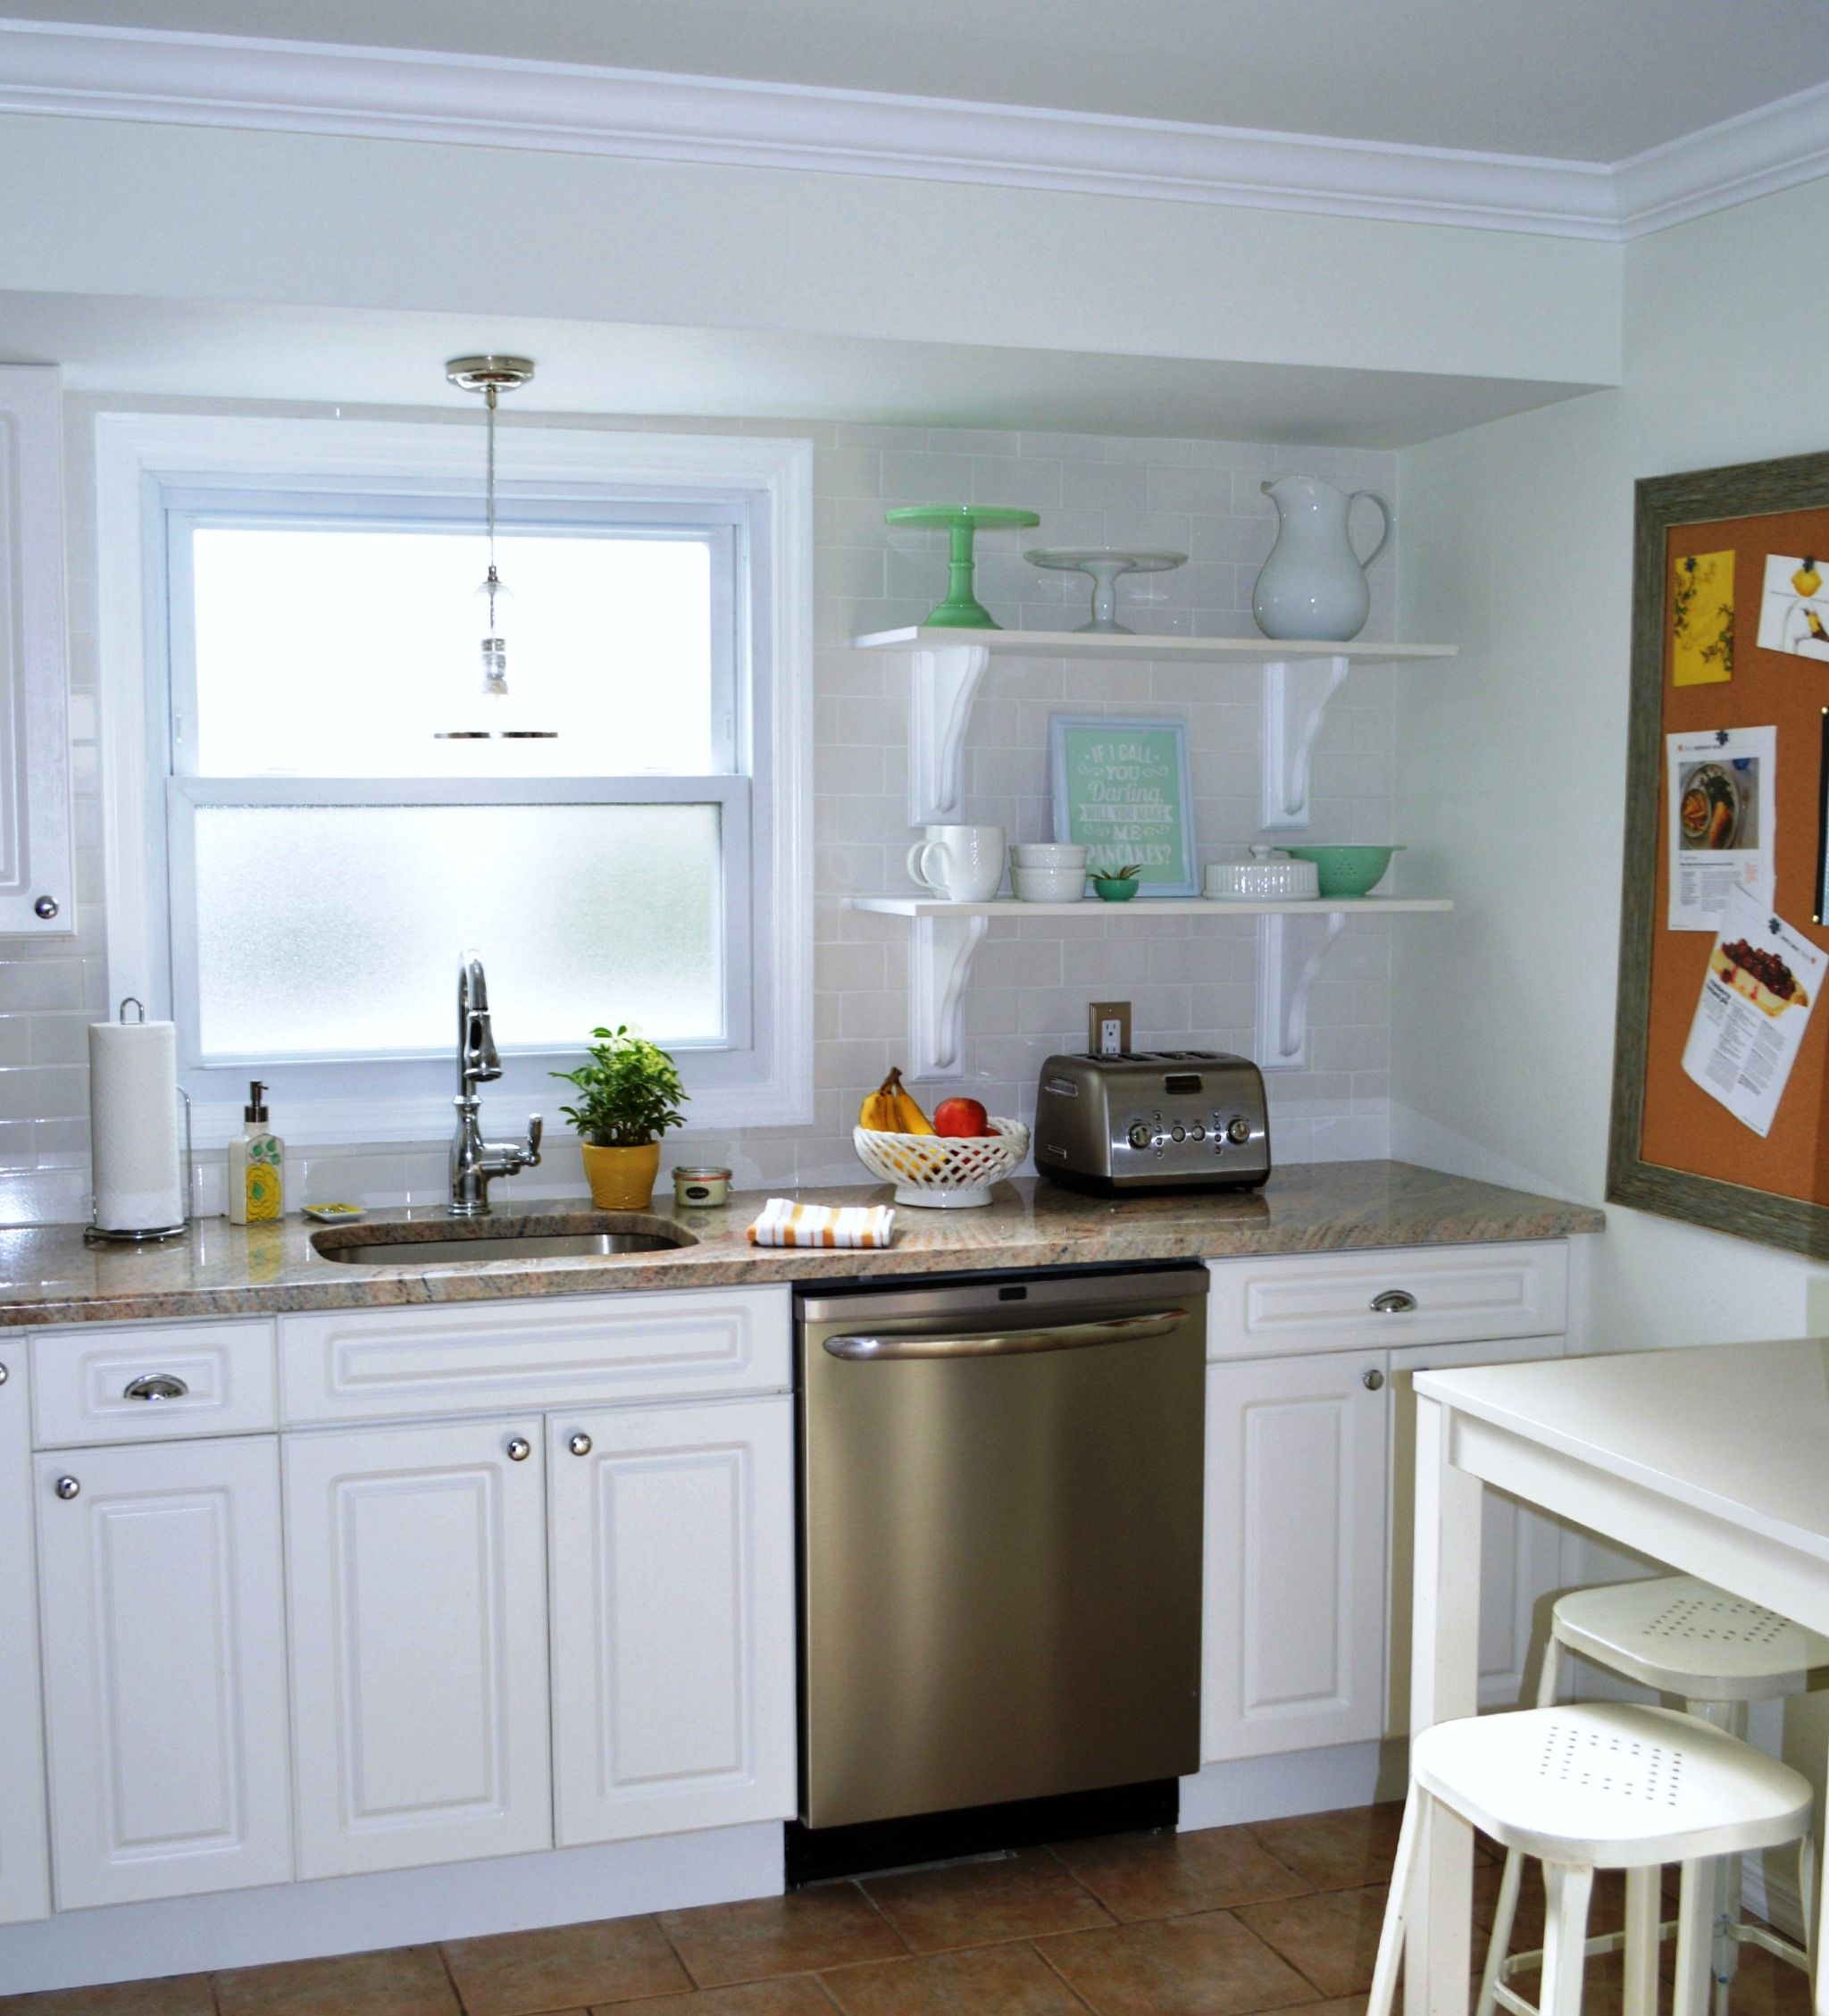 20+ Small Kitchen Remodel Ideas – Storage And Organization Hacks ...